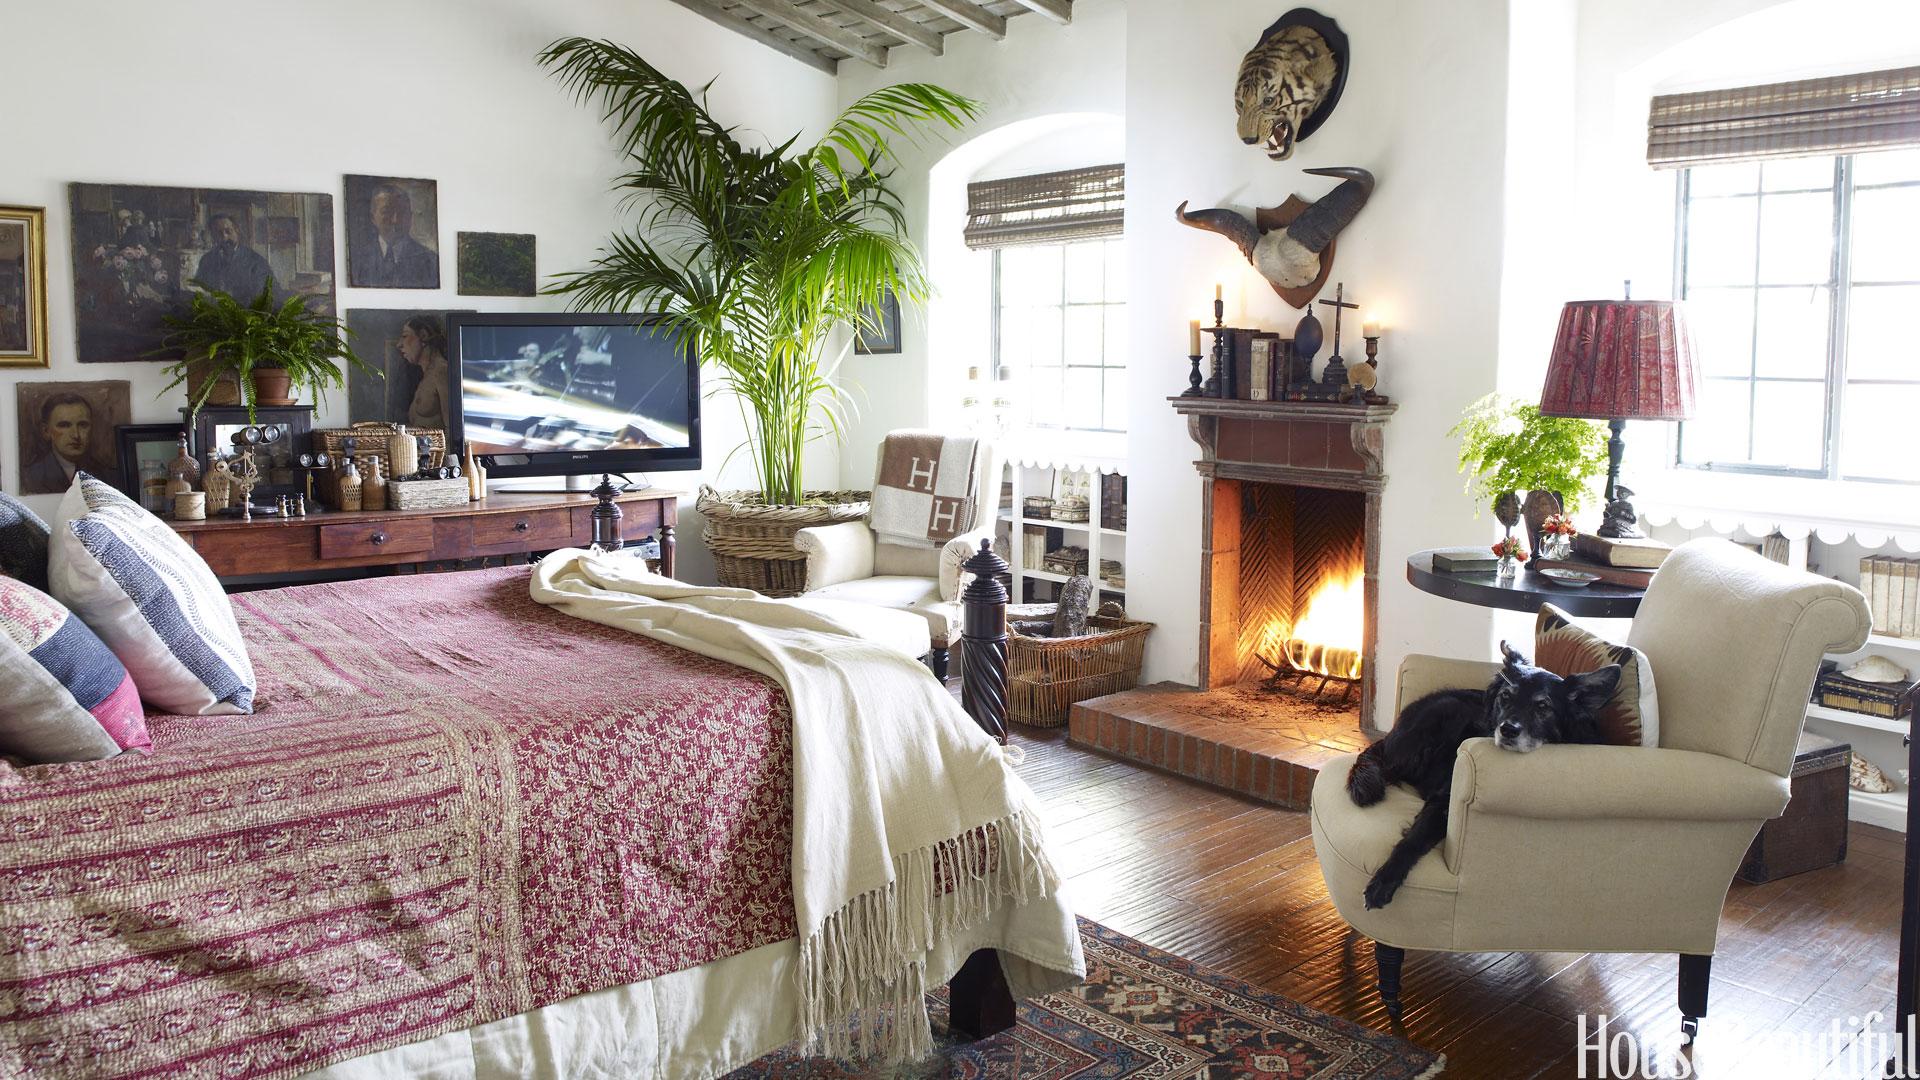 25 Cozy Bedroom Ideas - How To Make Your Bedroom Feel Cozy